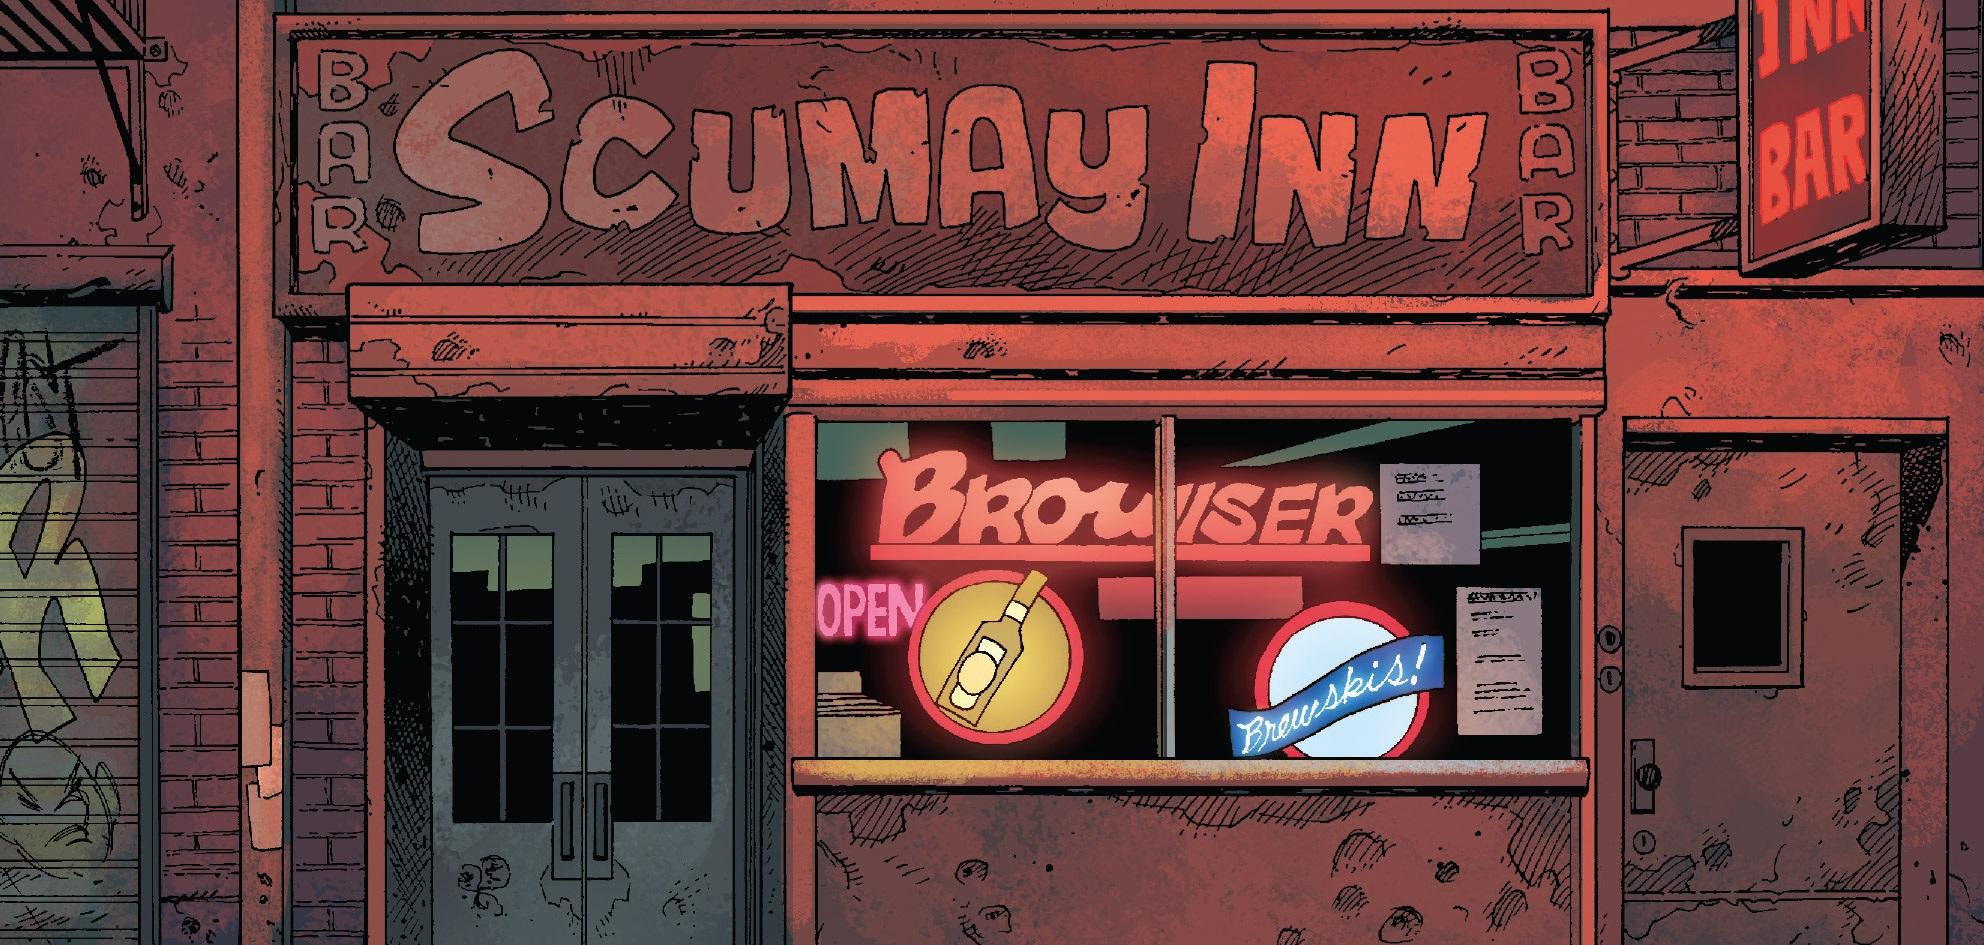 Scumay Inn/Gallery